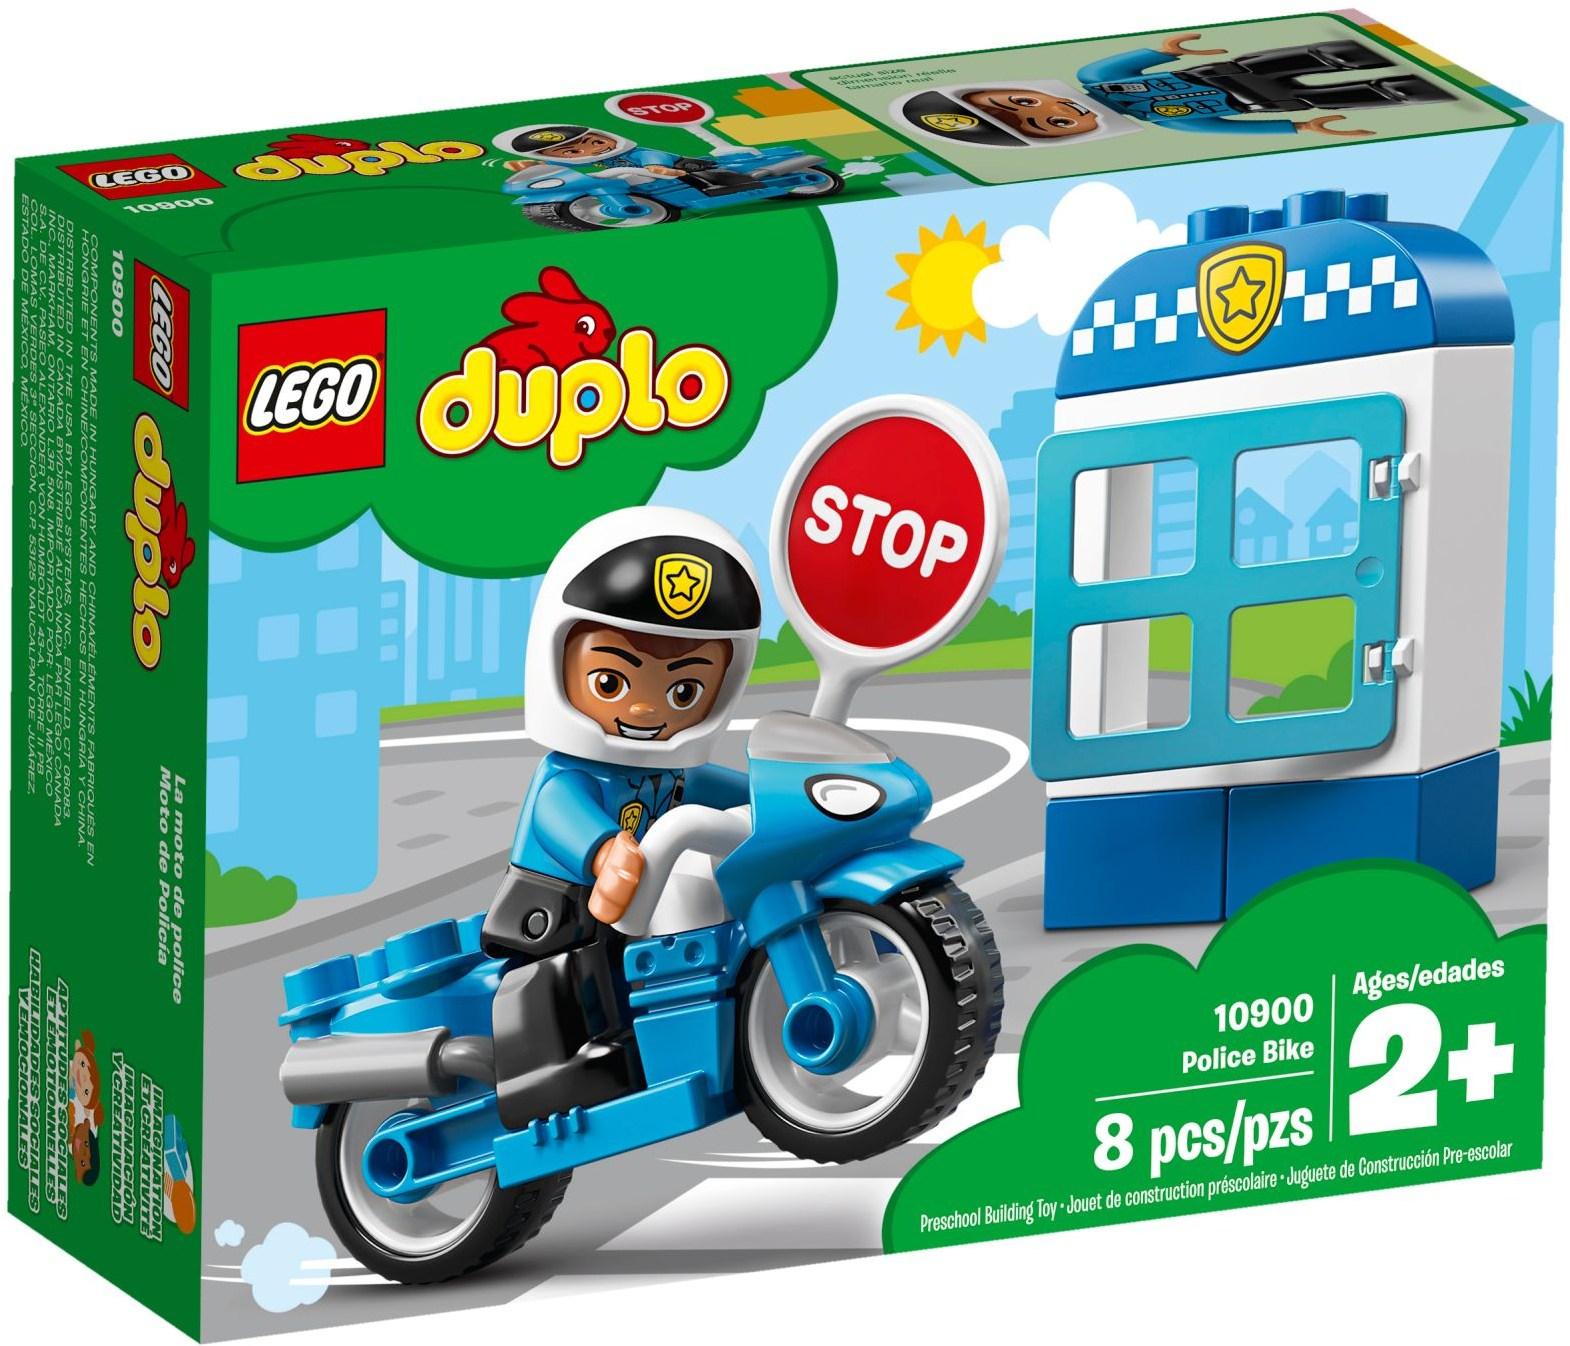 LEGO Police Bike - 10900